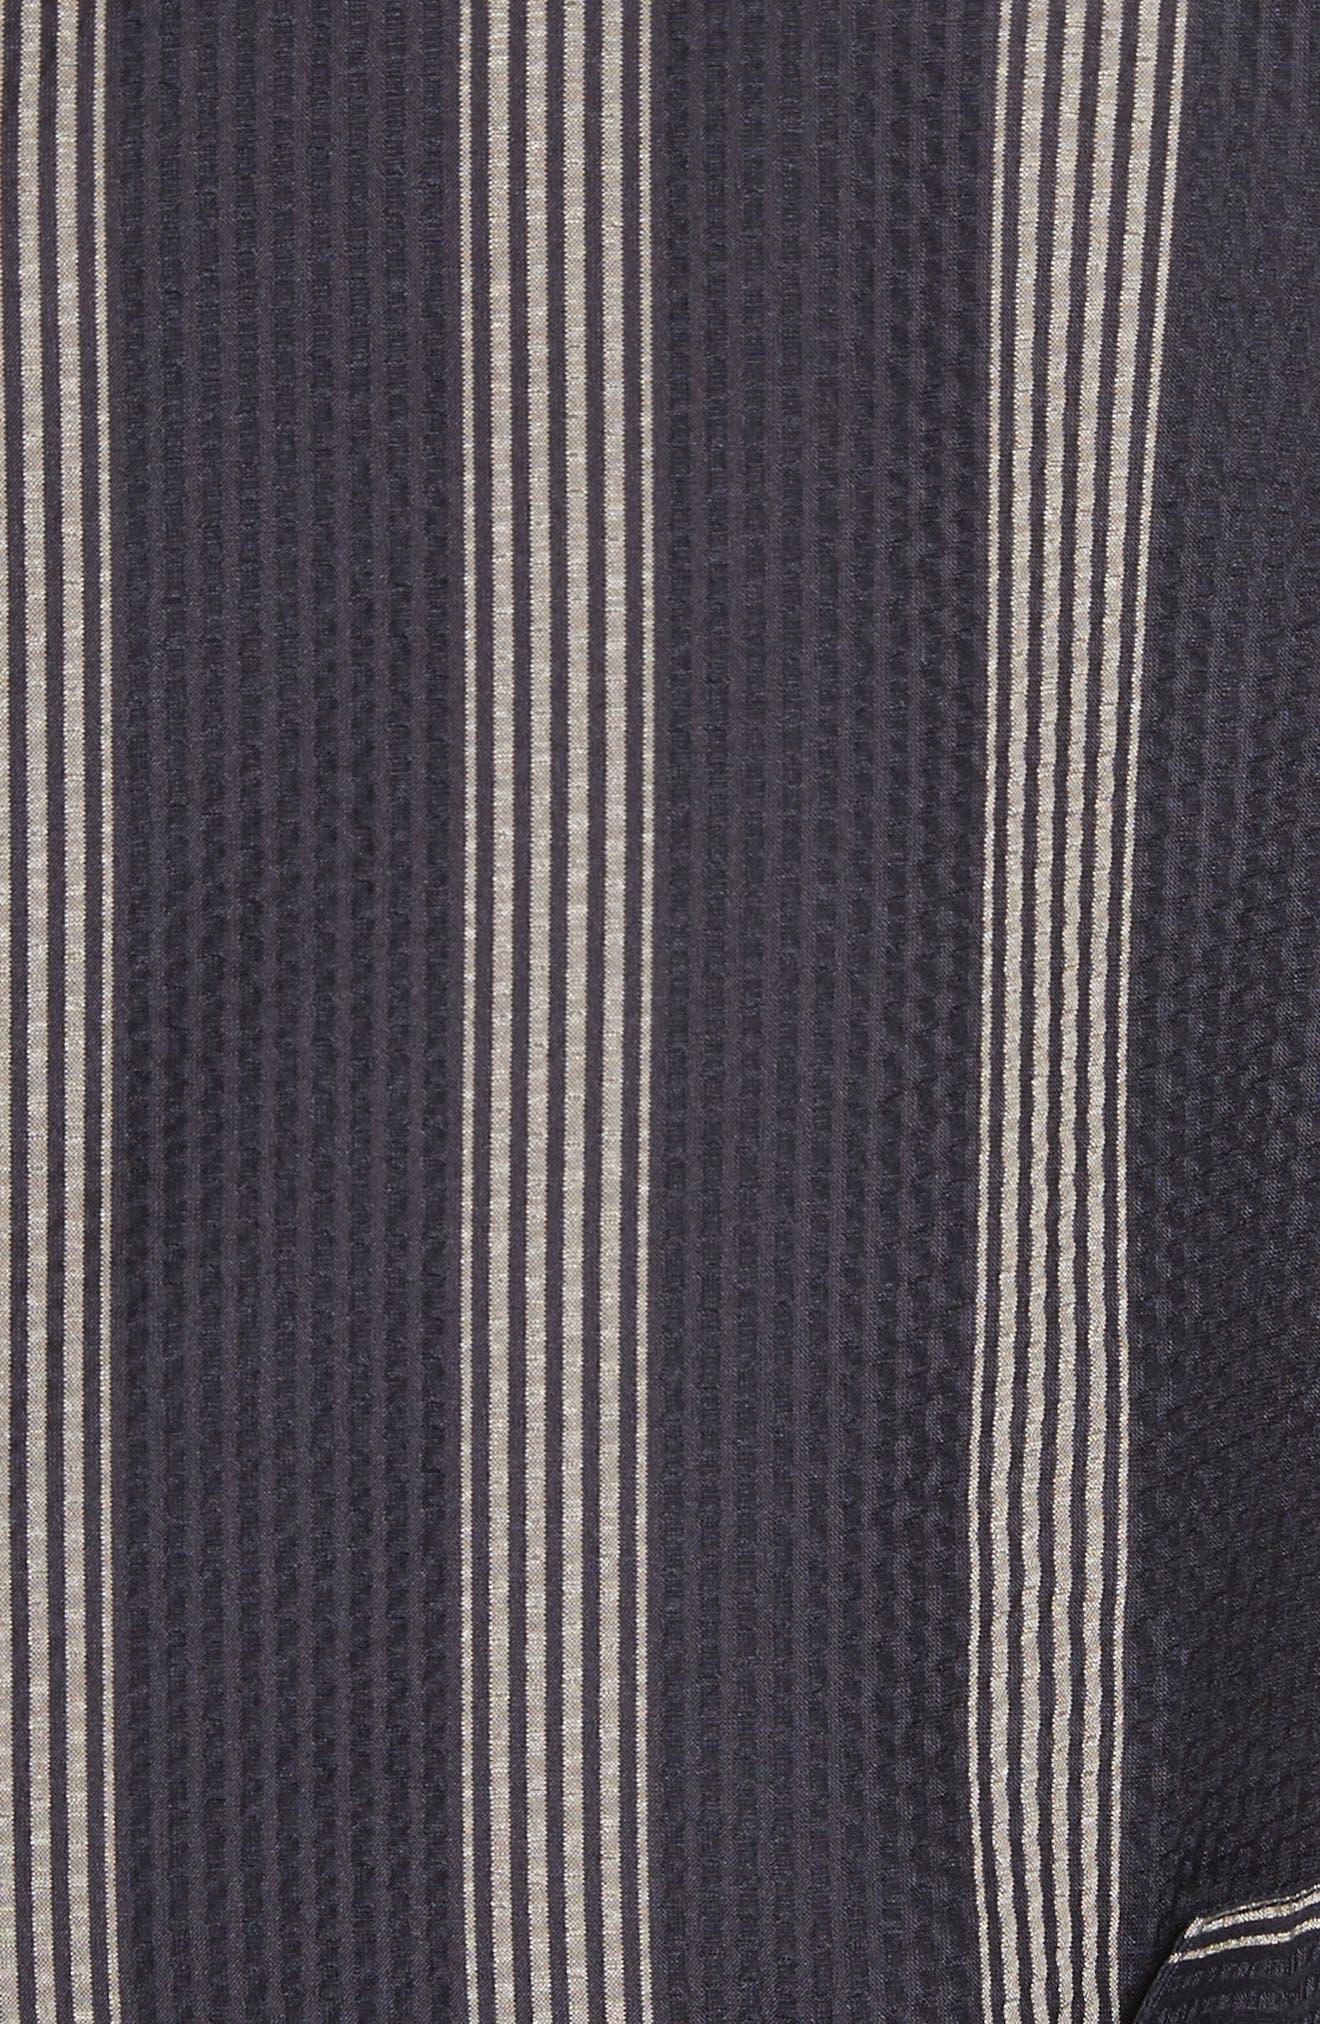 Stripe Silk Shirt,                             Alternate thumbnail 5, color,                             Black/White